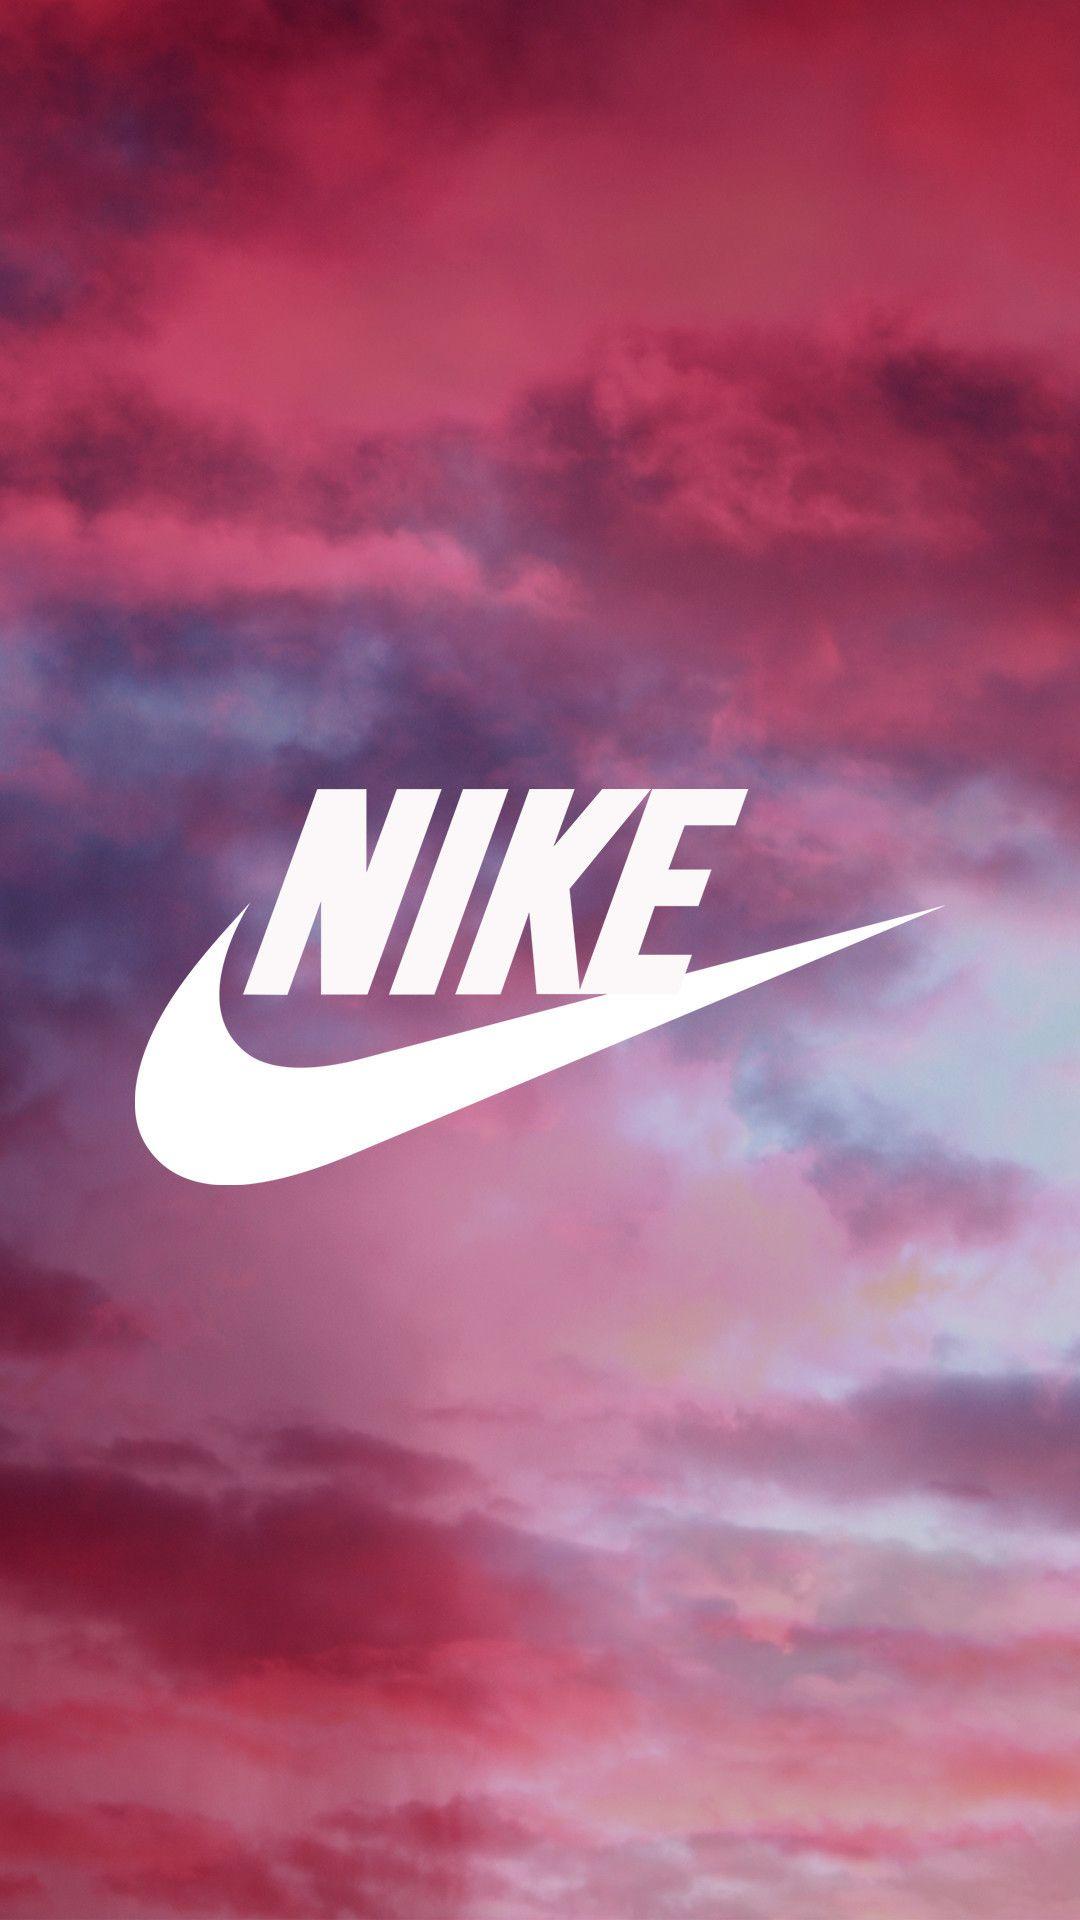 Just Do It Nike Running Wallpapers On Wallpaperdog